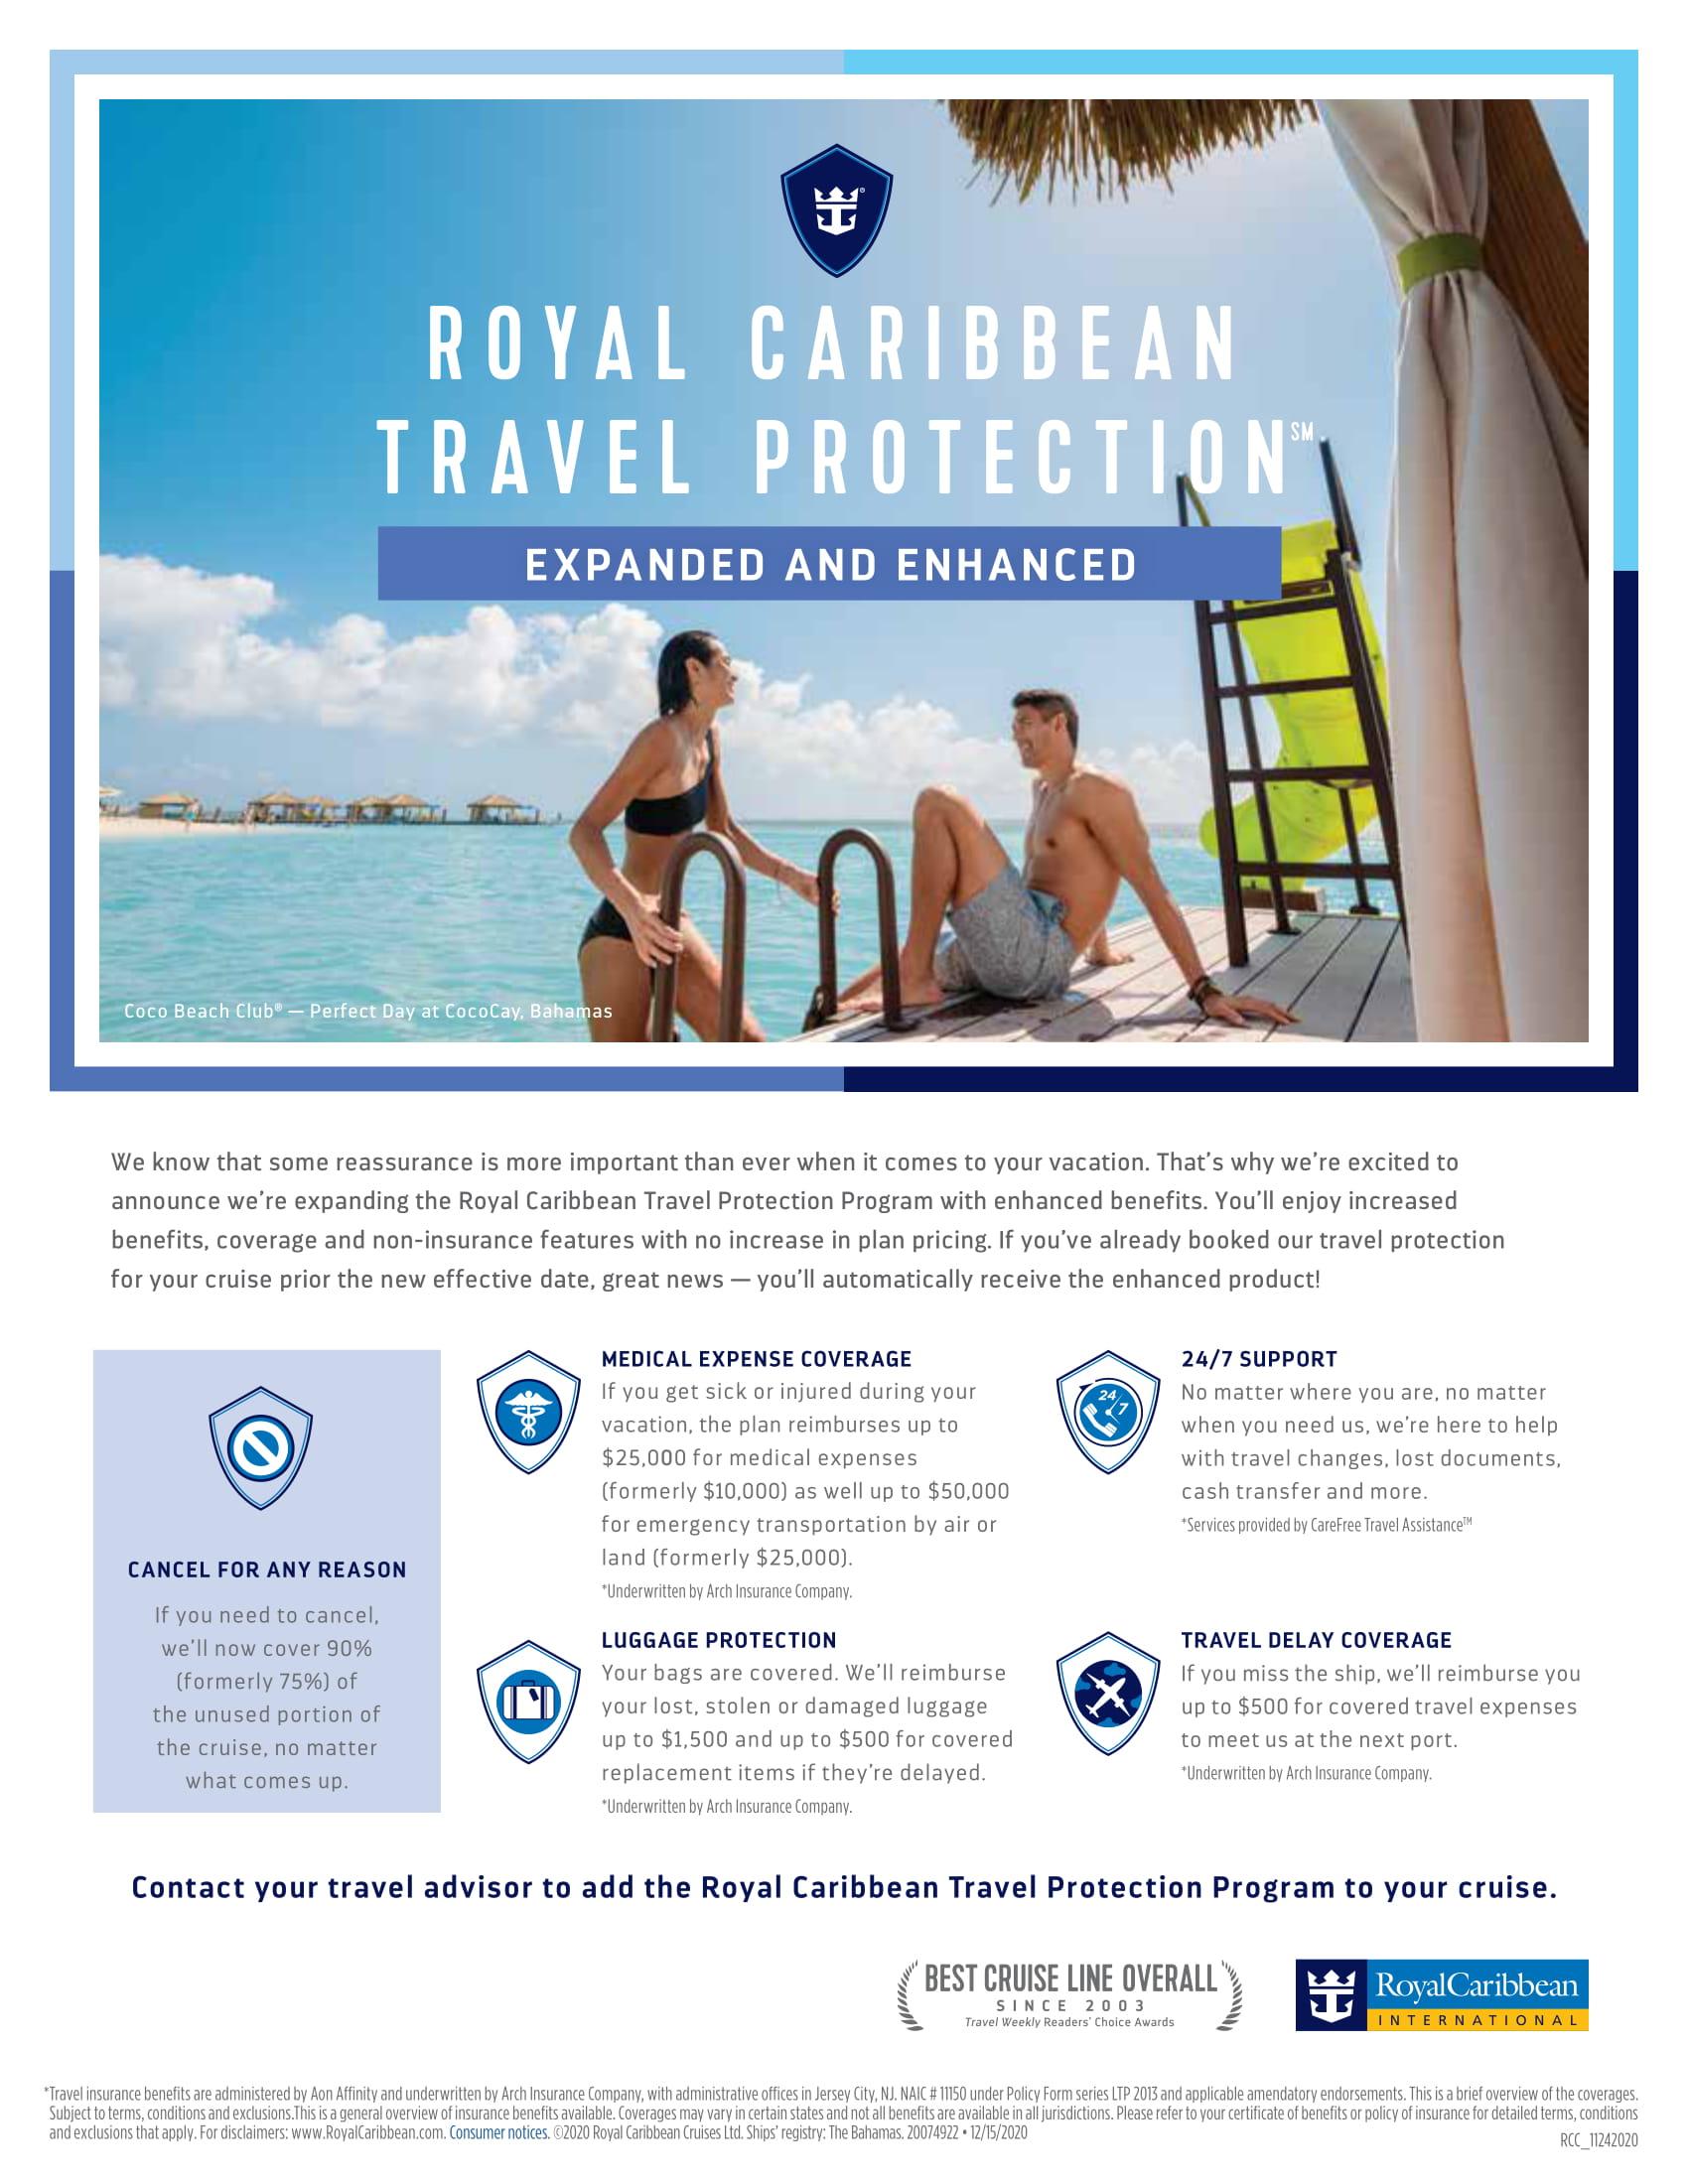 15045835_Royal_Caribbean_Travel_Protection_Program_Consumer_Flyer-1